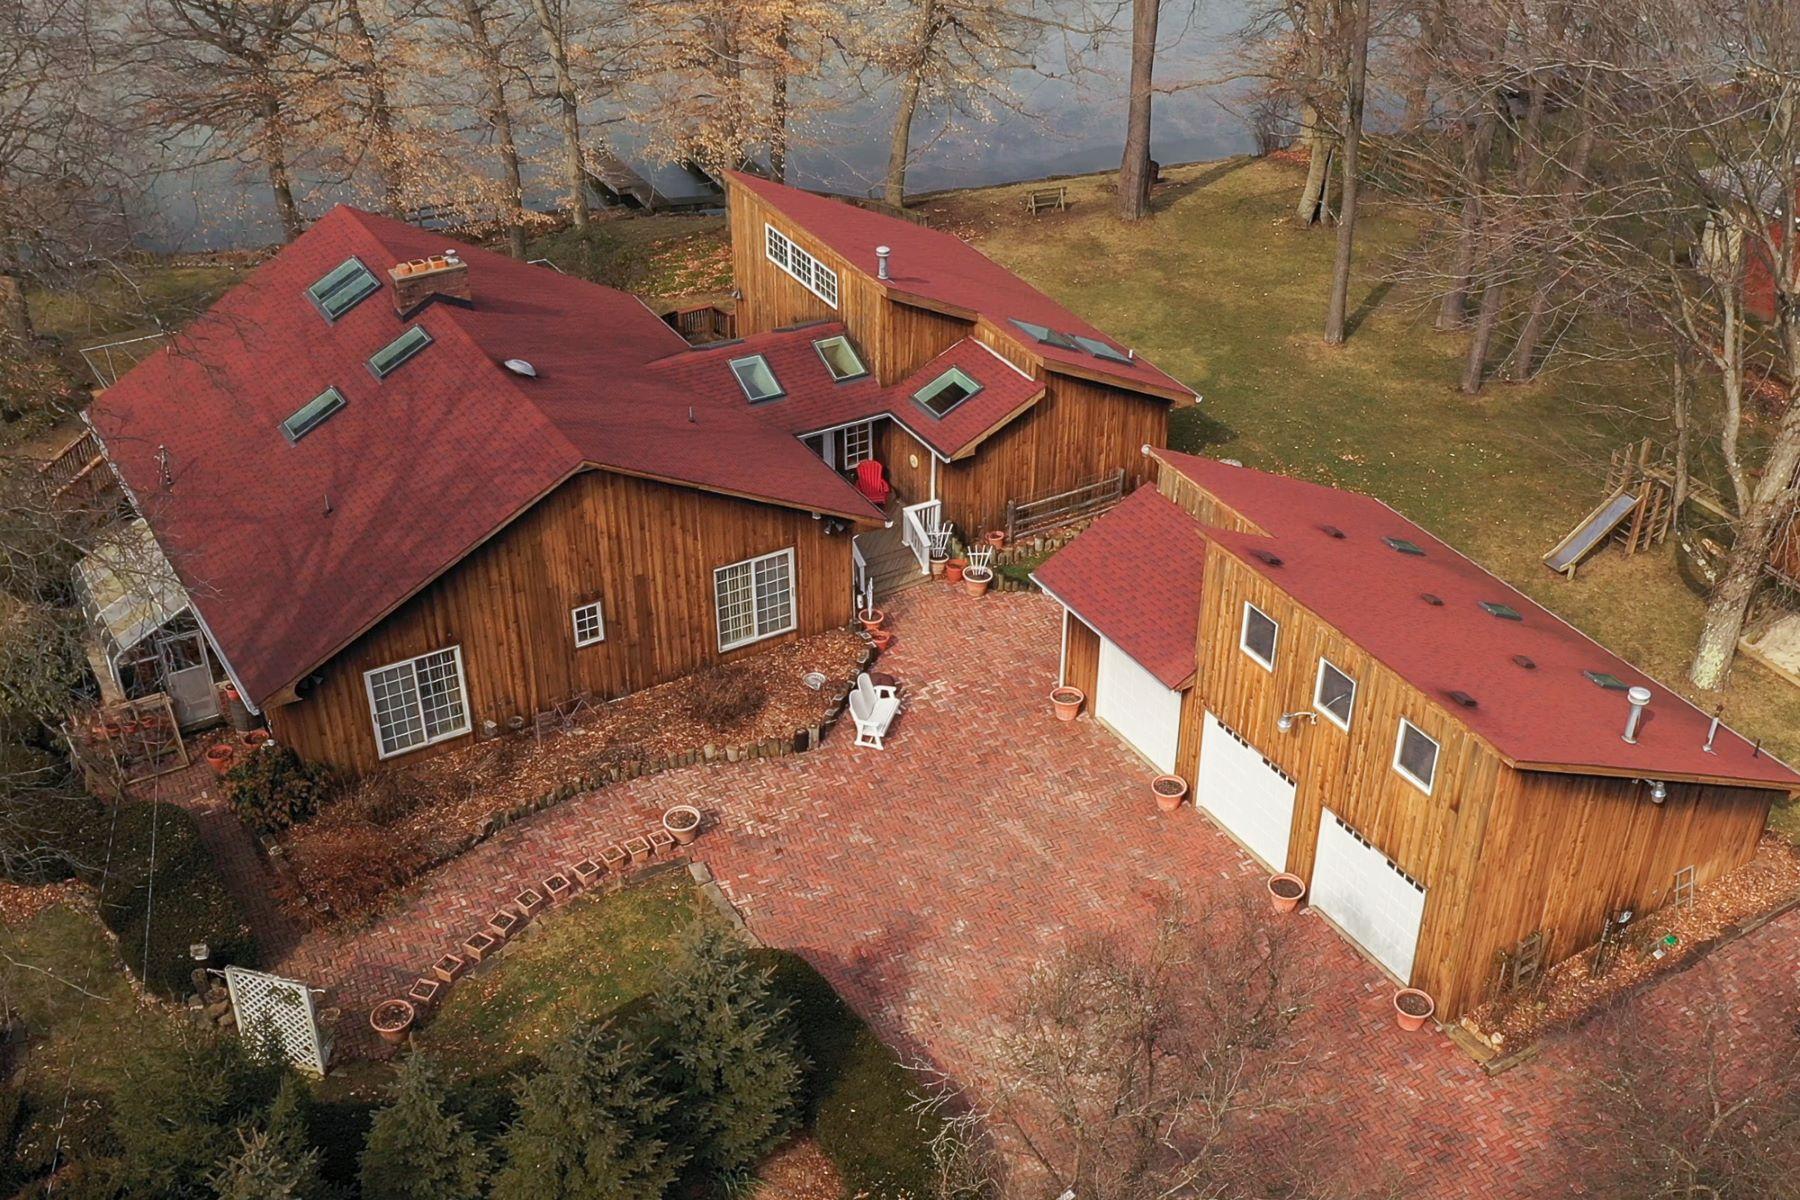 Single Family Homes por un Venta en 440 Latonka Drive, Mercer 440 Latonka Drive Mercer, Pennsylvania 16137 Estados Unidos